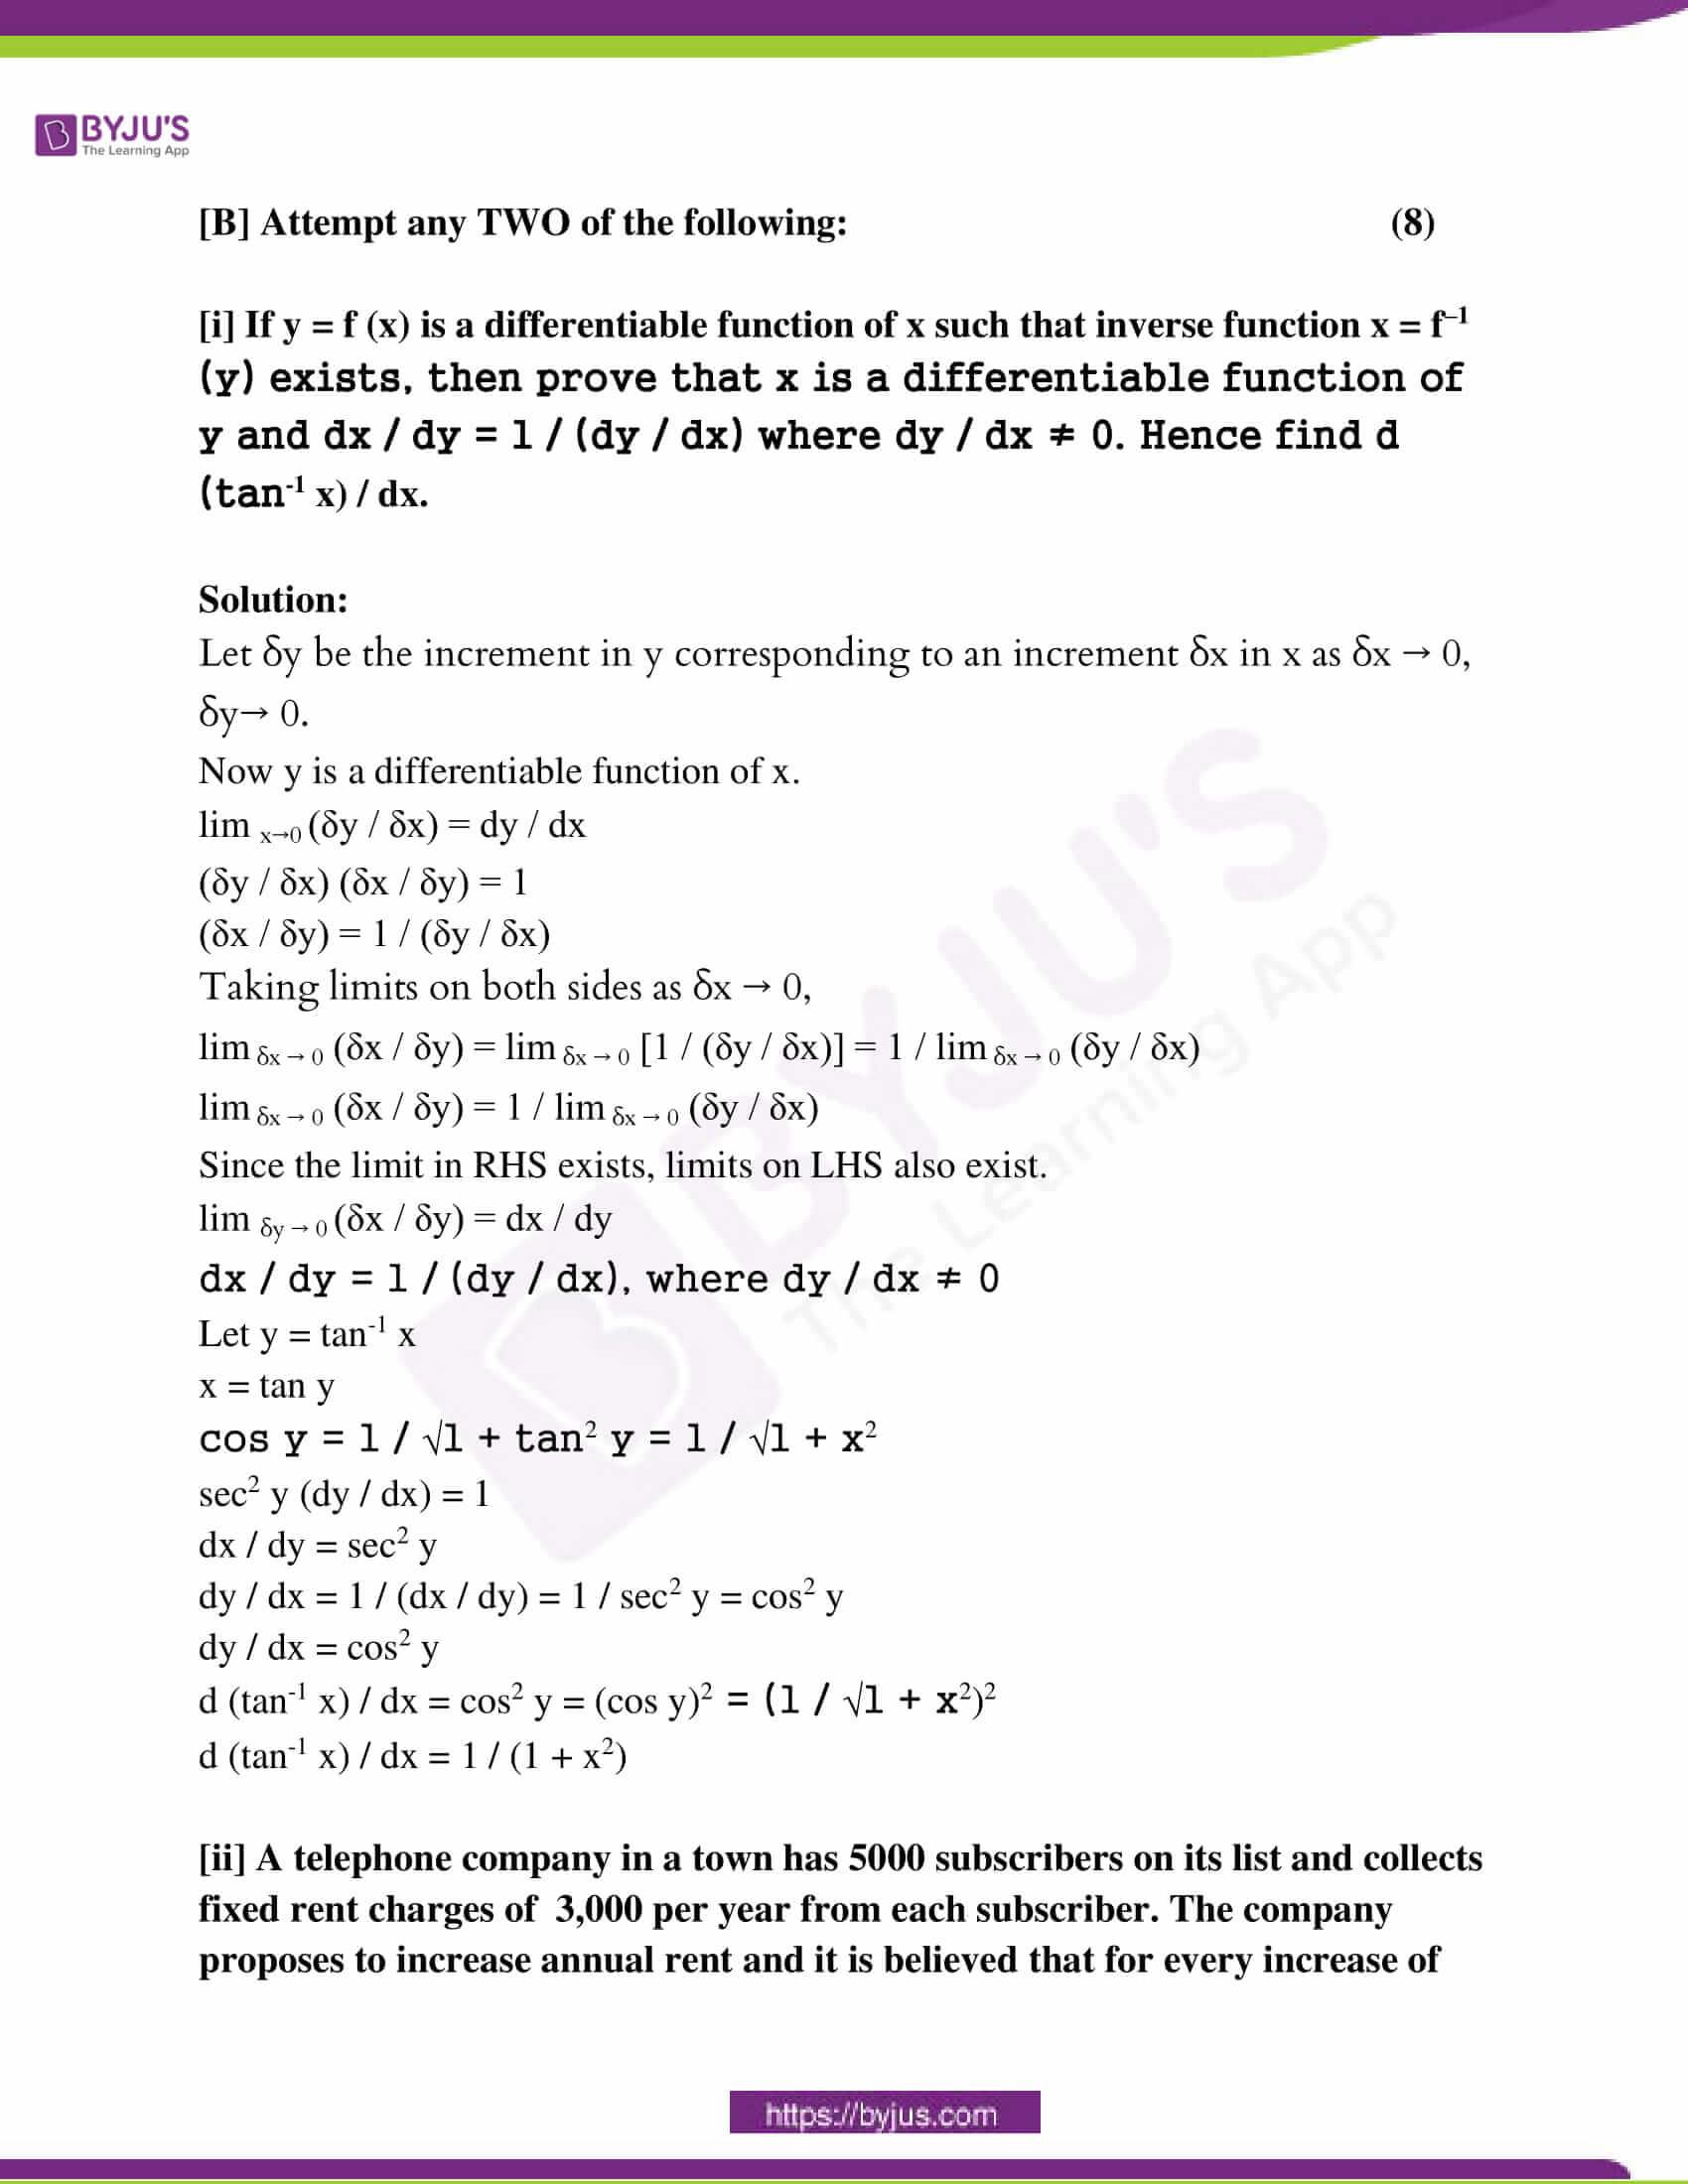 maharashtra class 12 exam question paper solutions march 2017 20